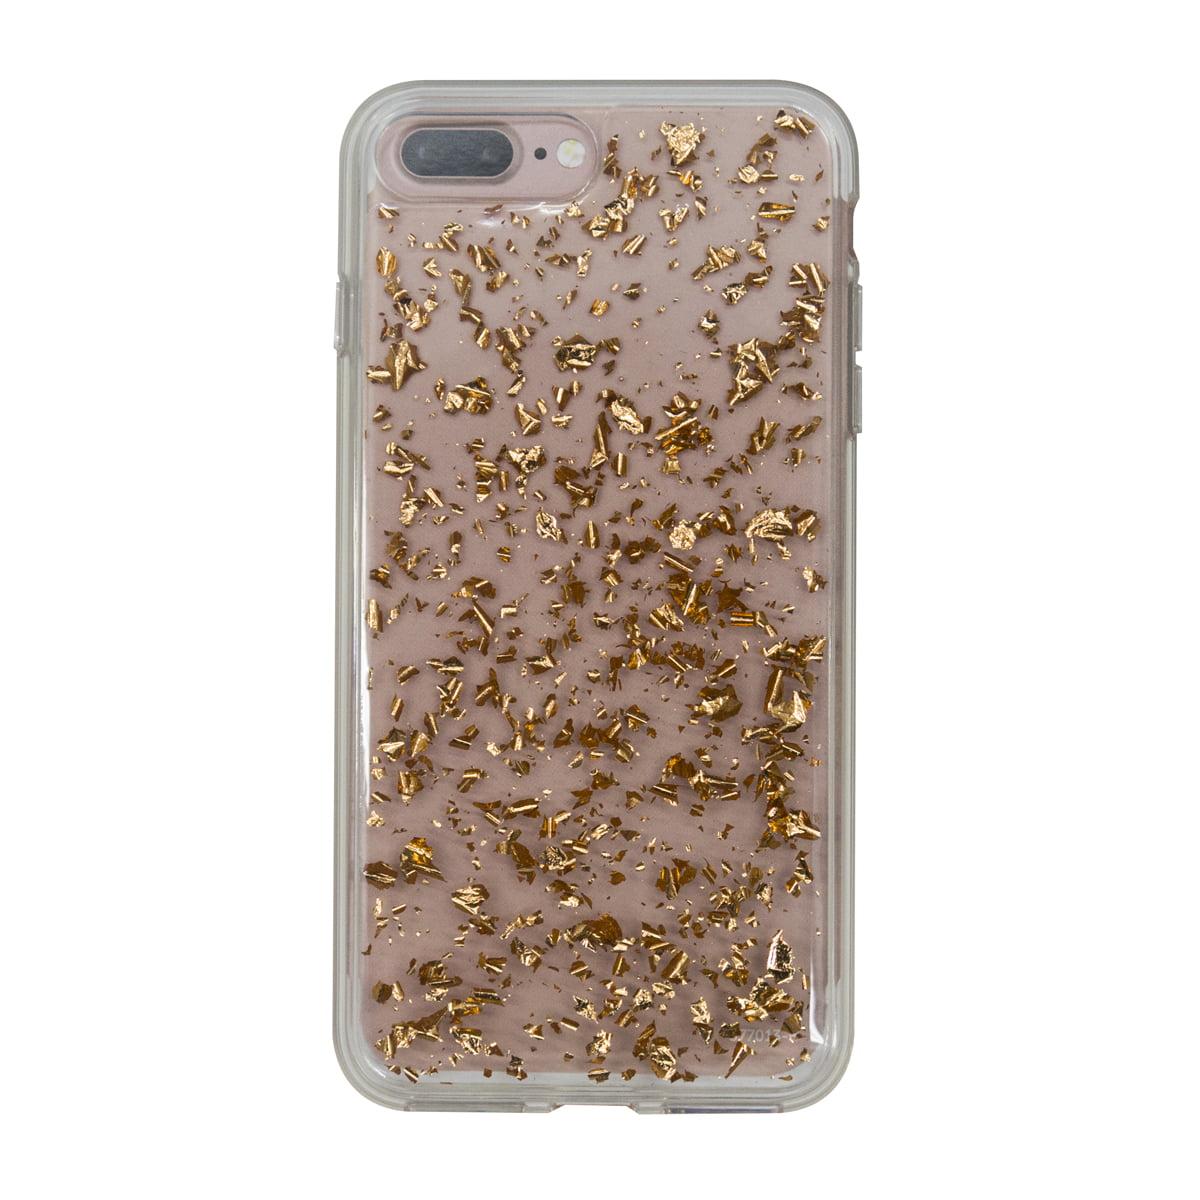 Onn Lightweight Slim Clear Case For iPhone 7 Plus/8 Plus, Rose Gold Flecks